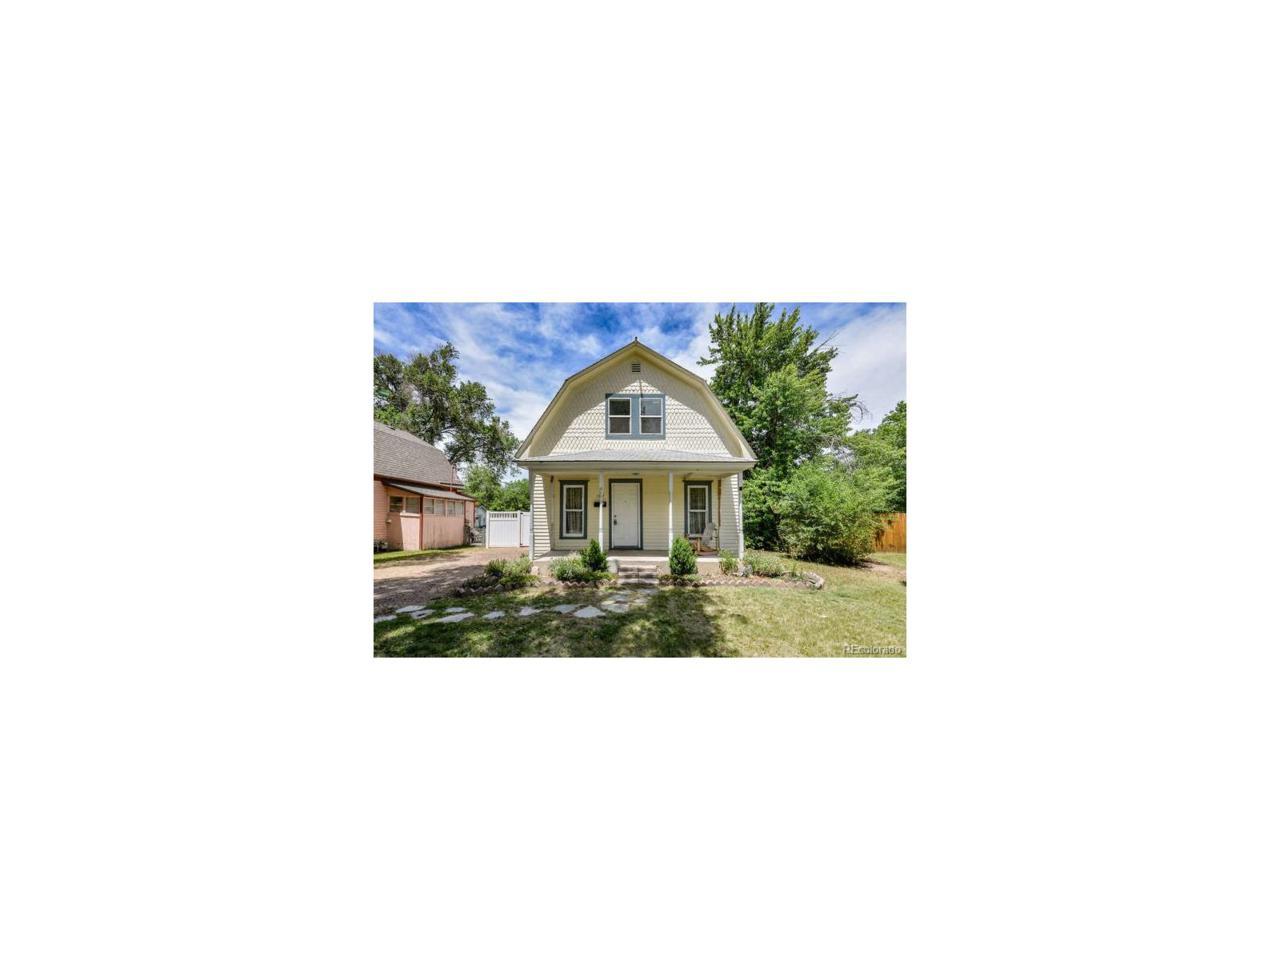 1317 13th Street, Greeley, CO 80631 (MLS #4672373) :: 8z Real Estate